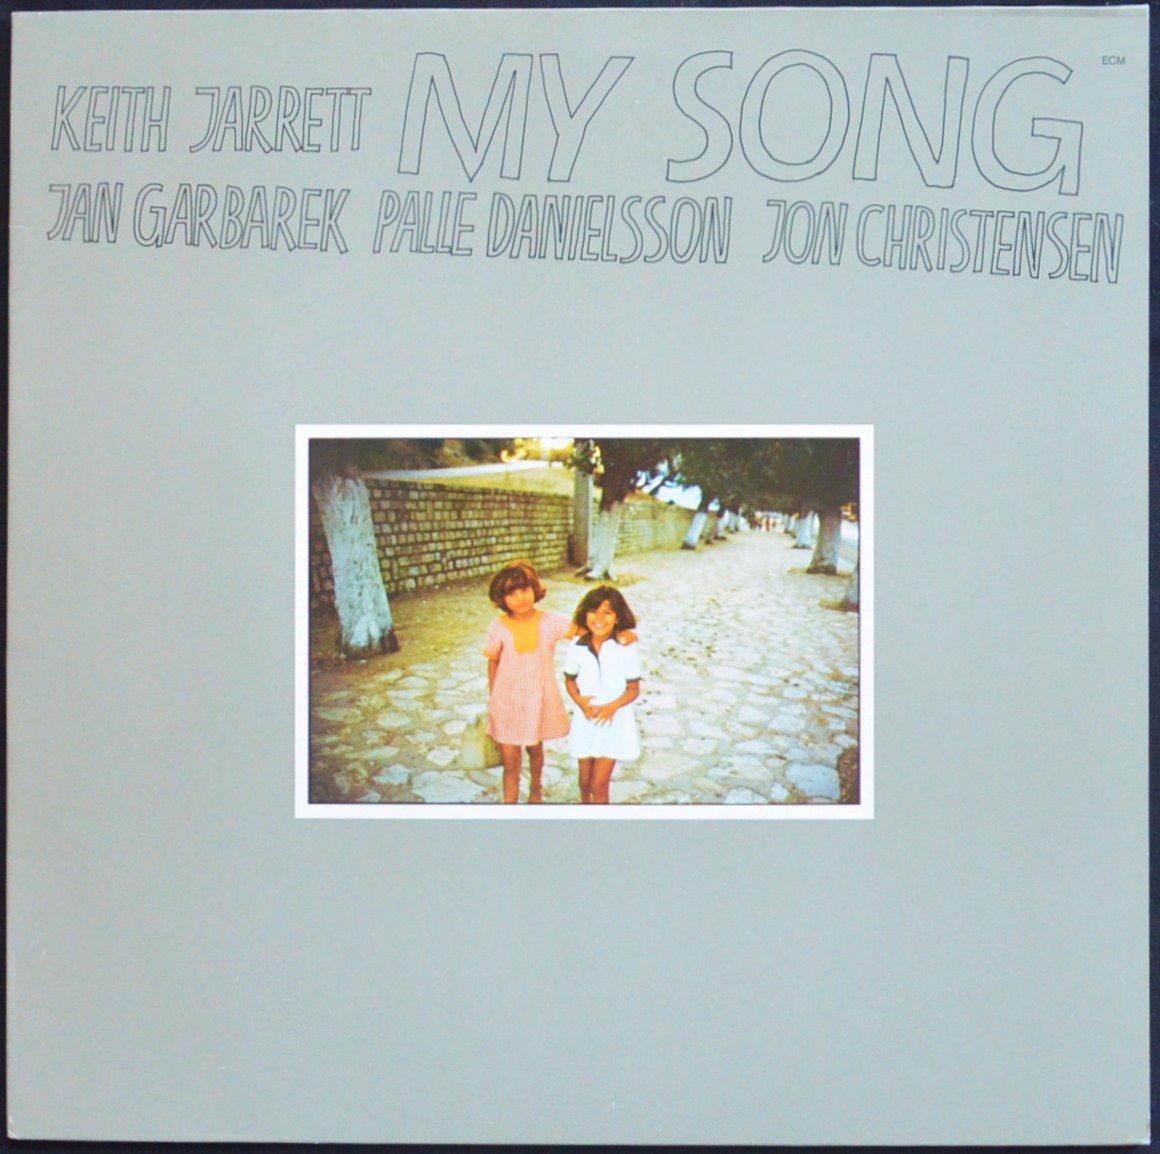 KEITH JARRETT / MY SONG (LP)